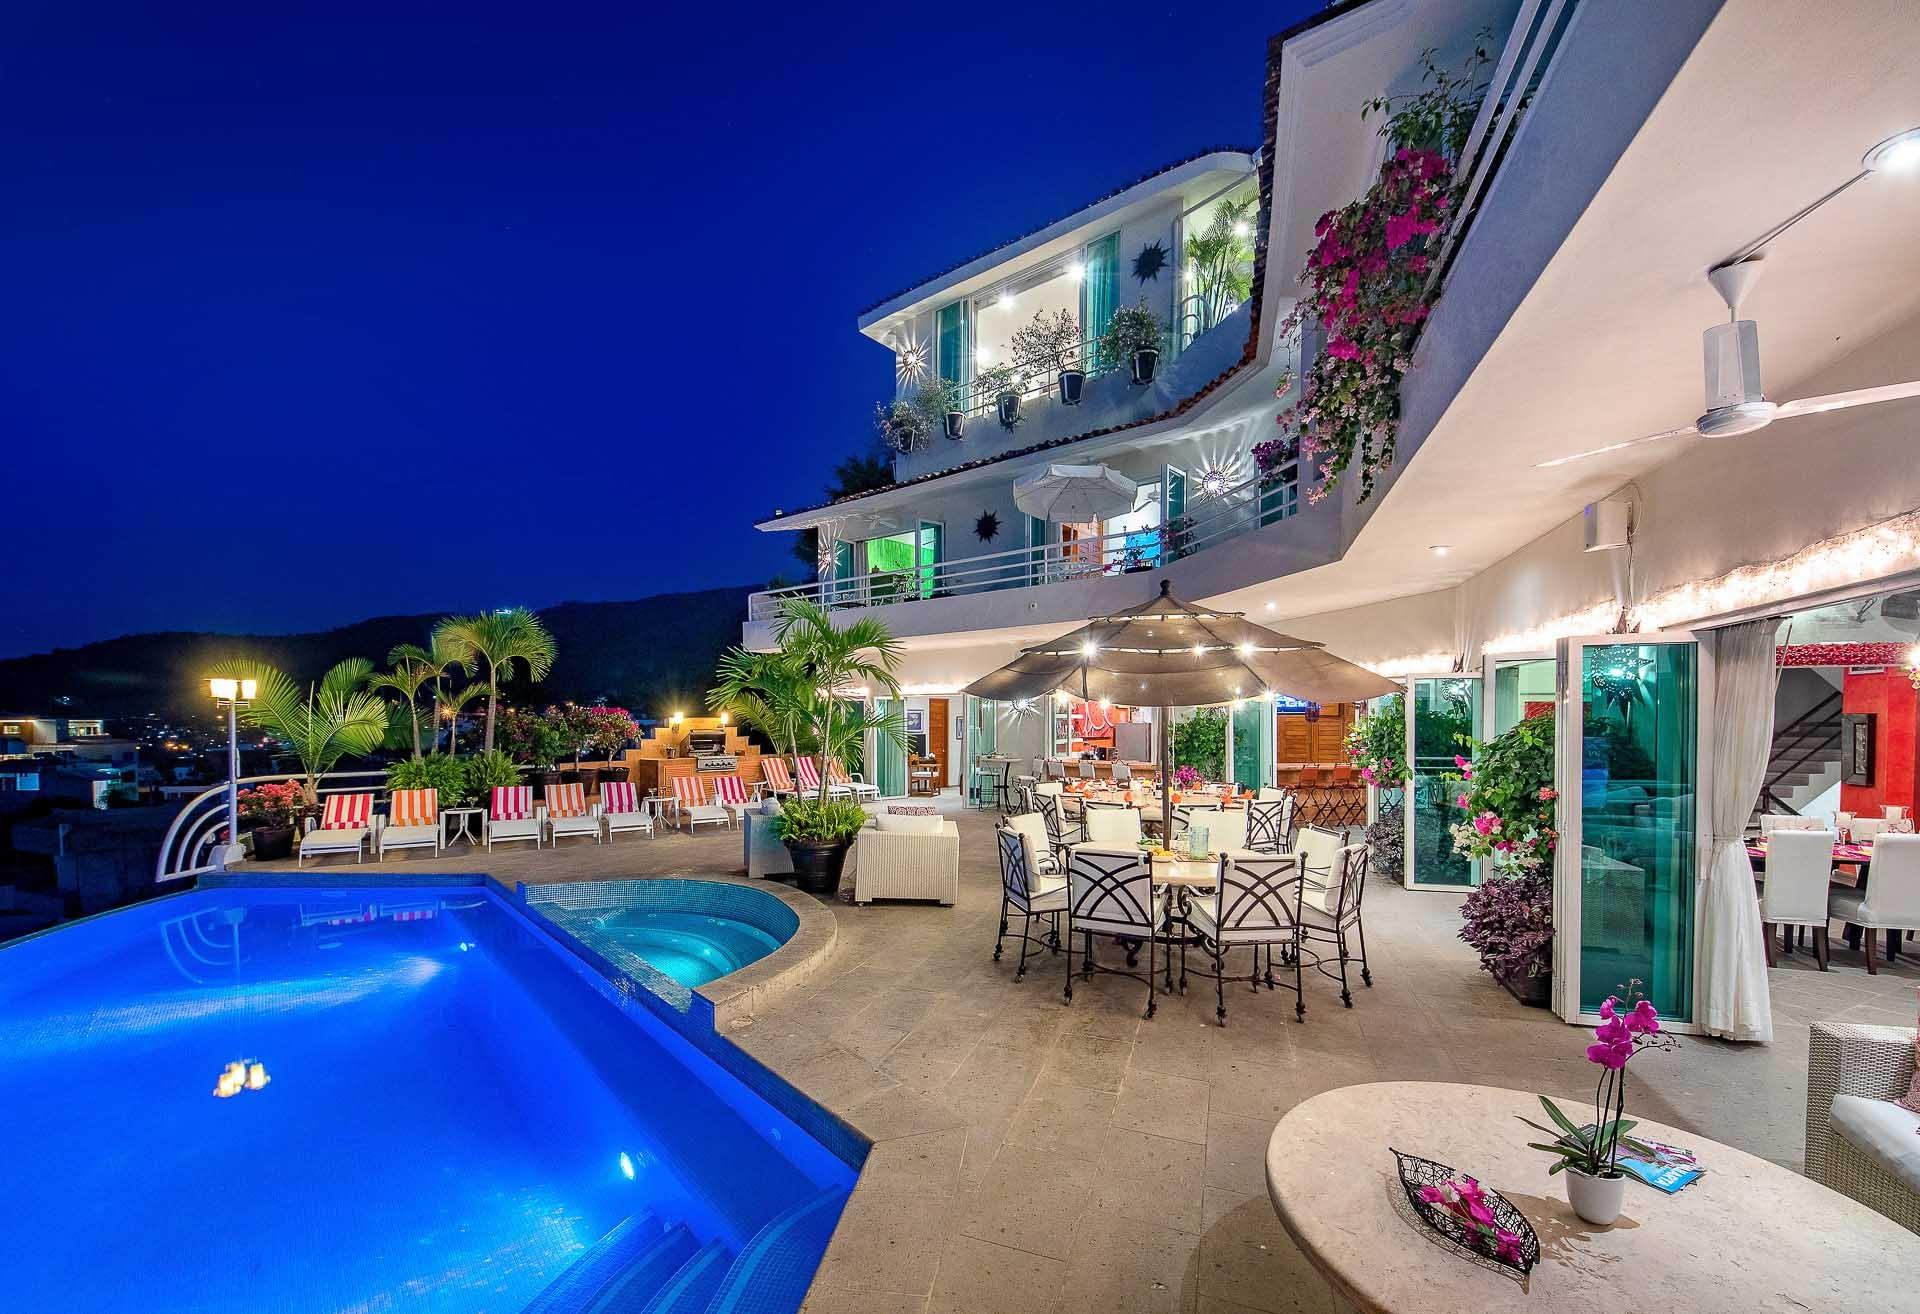 beautiful terrace and pool at casa yvonneka